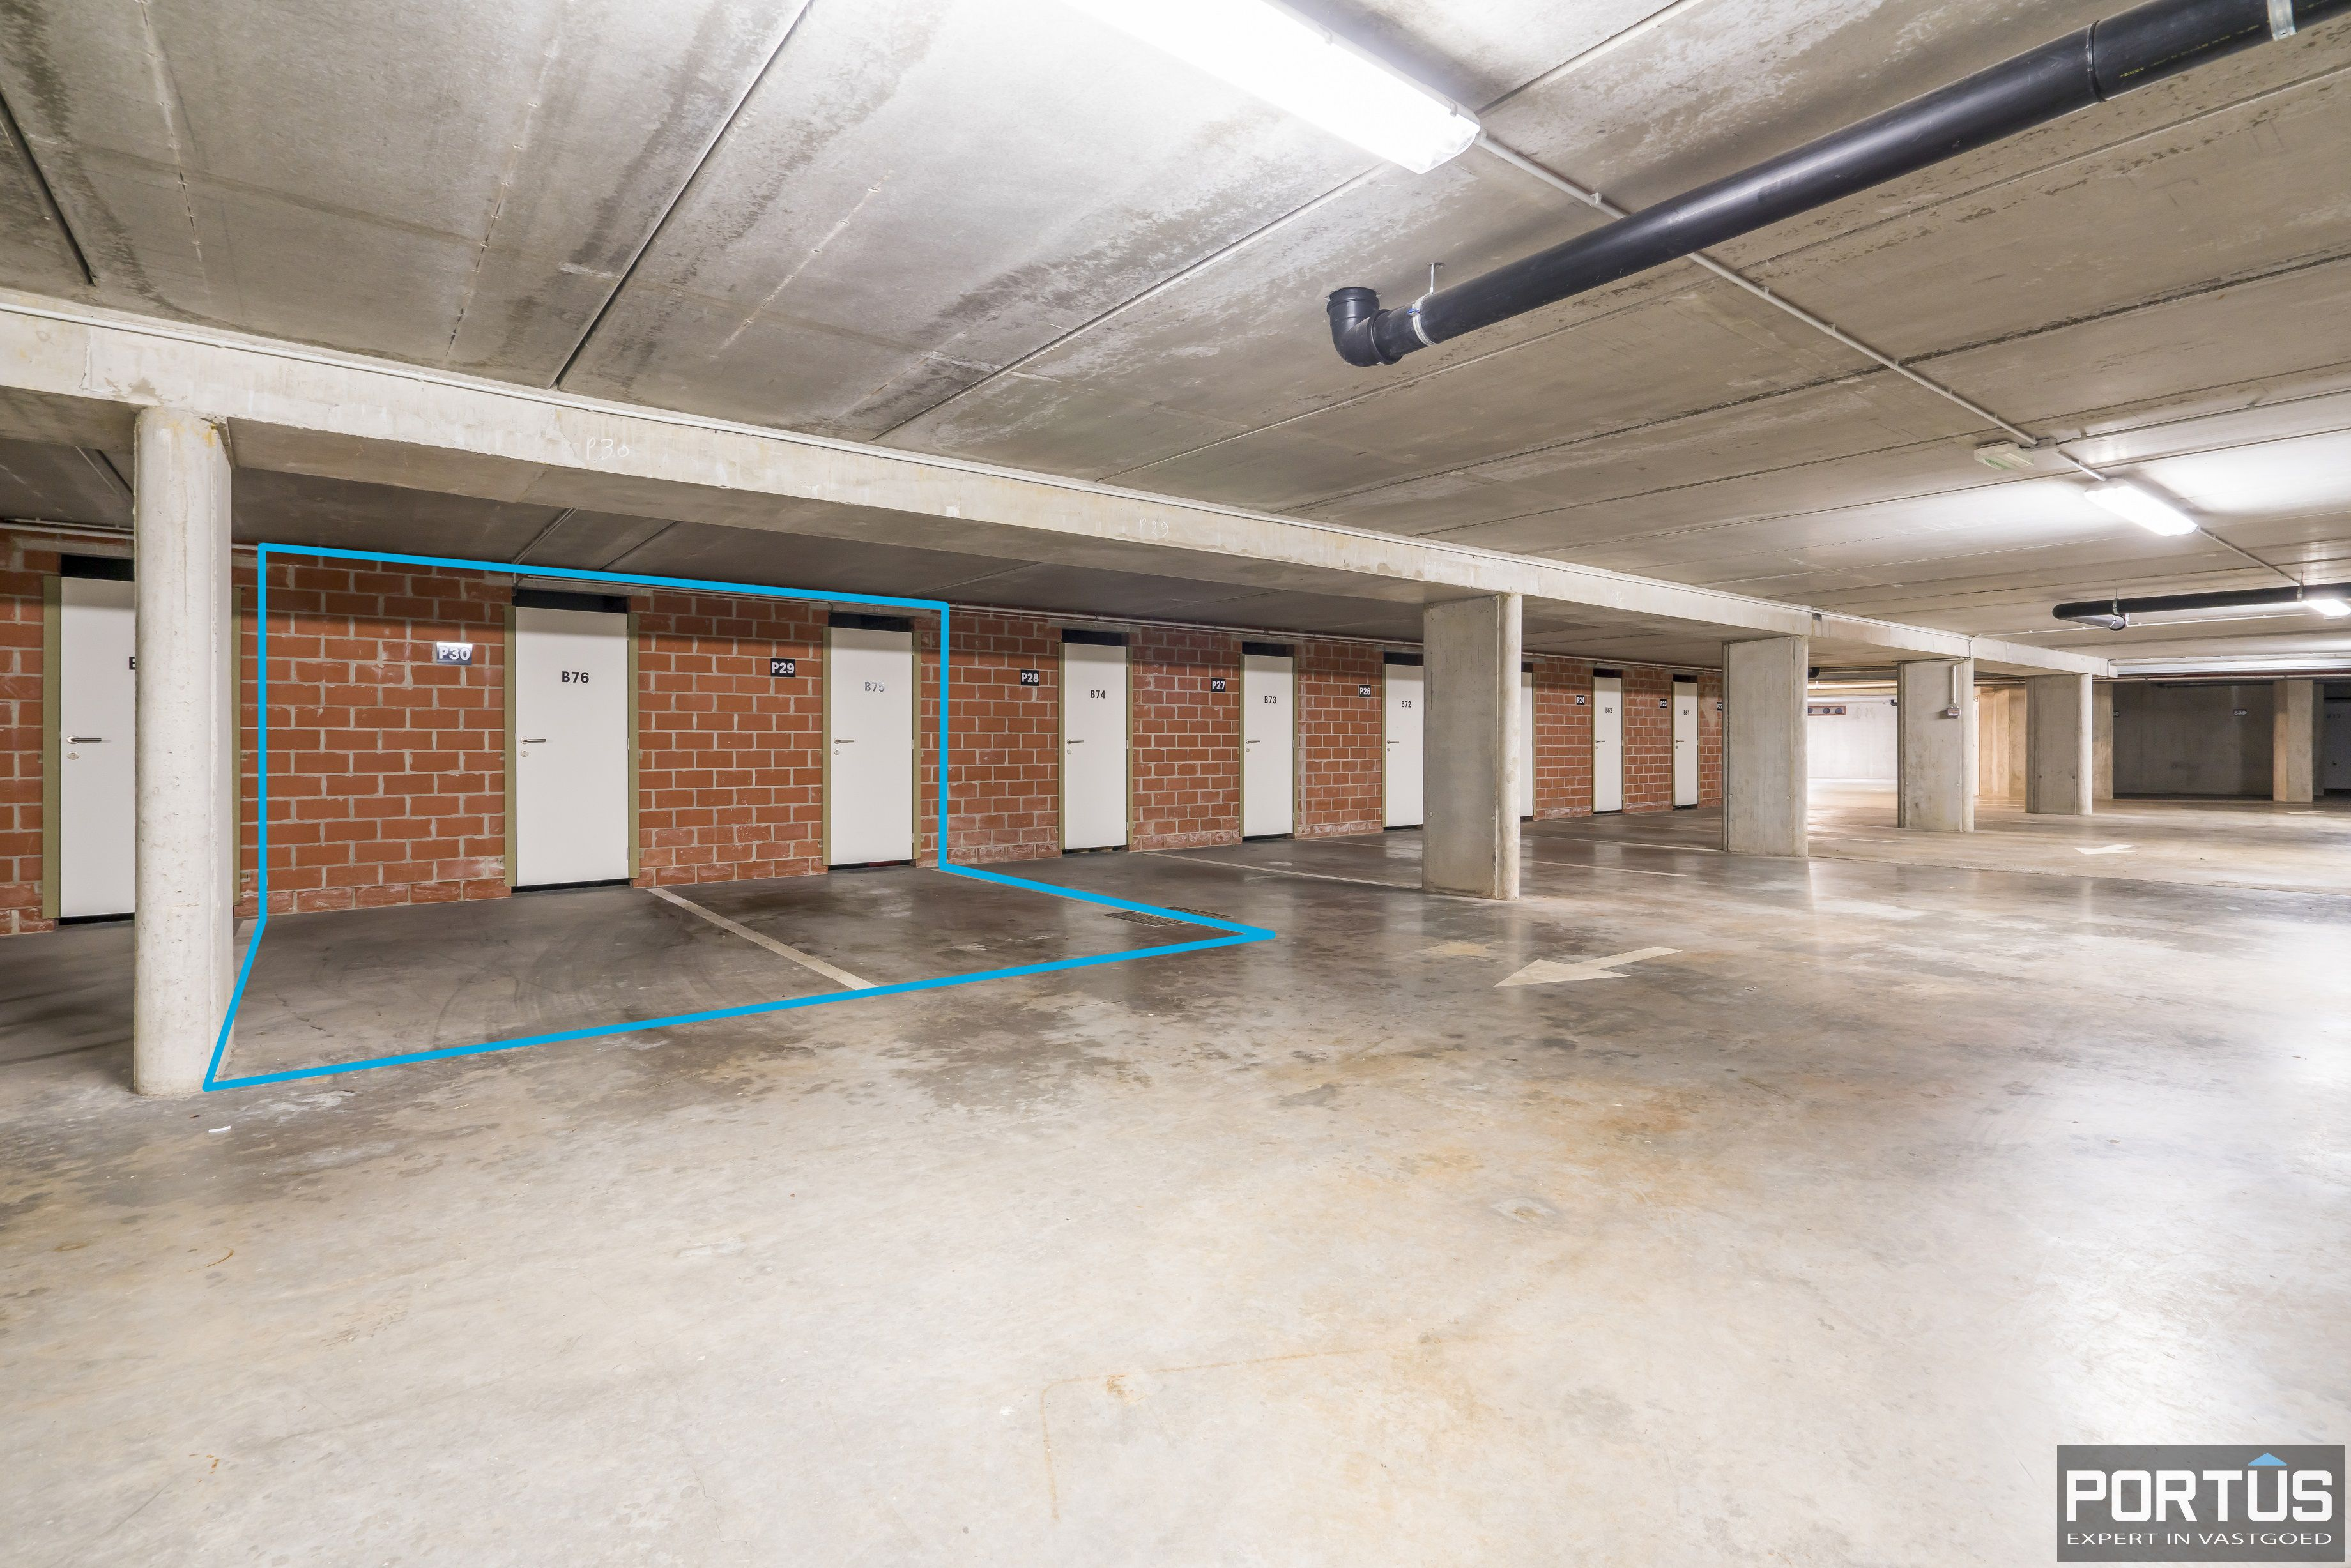 Appartement te koop met 2 slaapkamers in Residentie Waterfront te Nieuwpoort - 11876